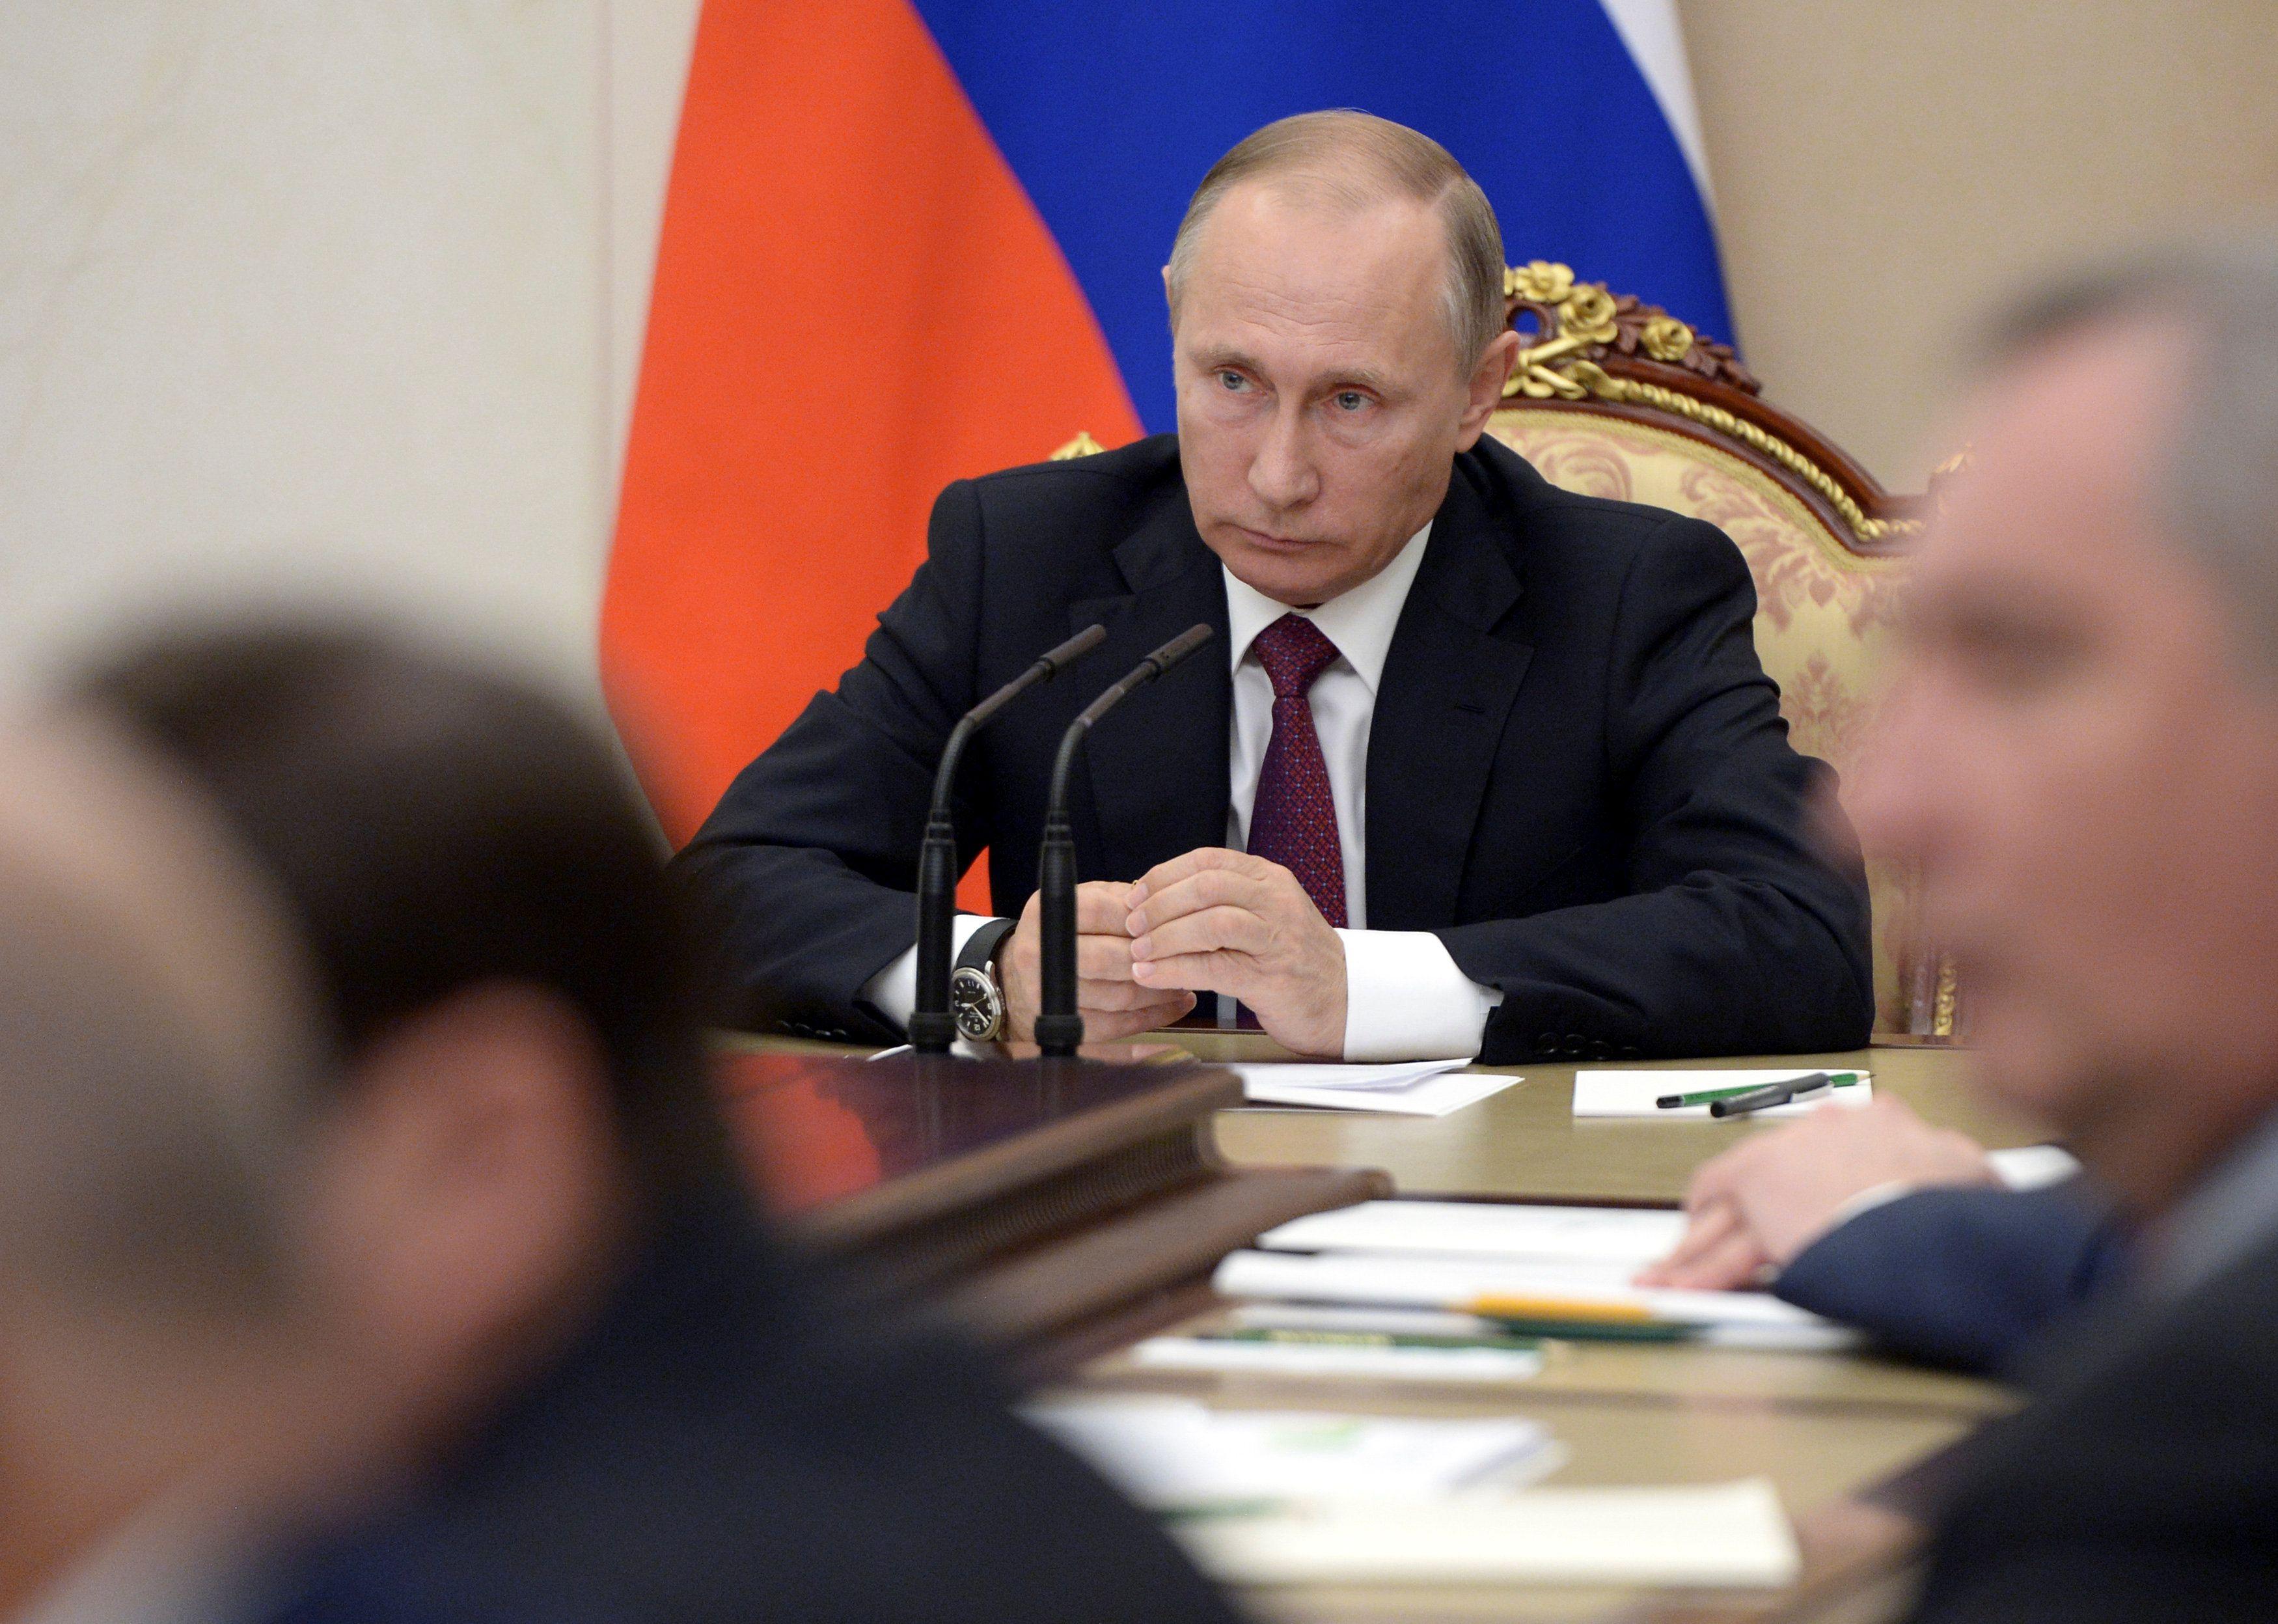 Журналист объяснил задачи путинского окружения